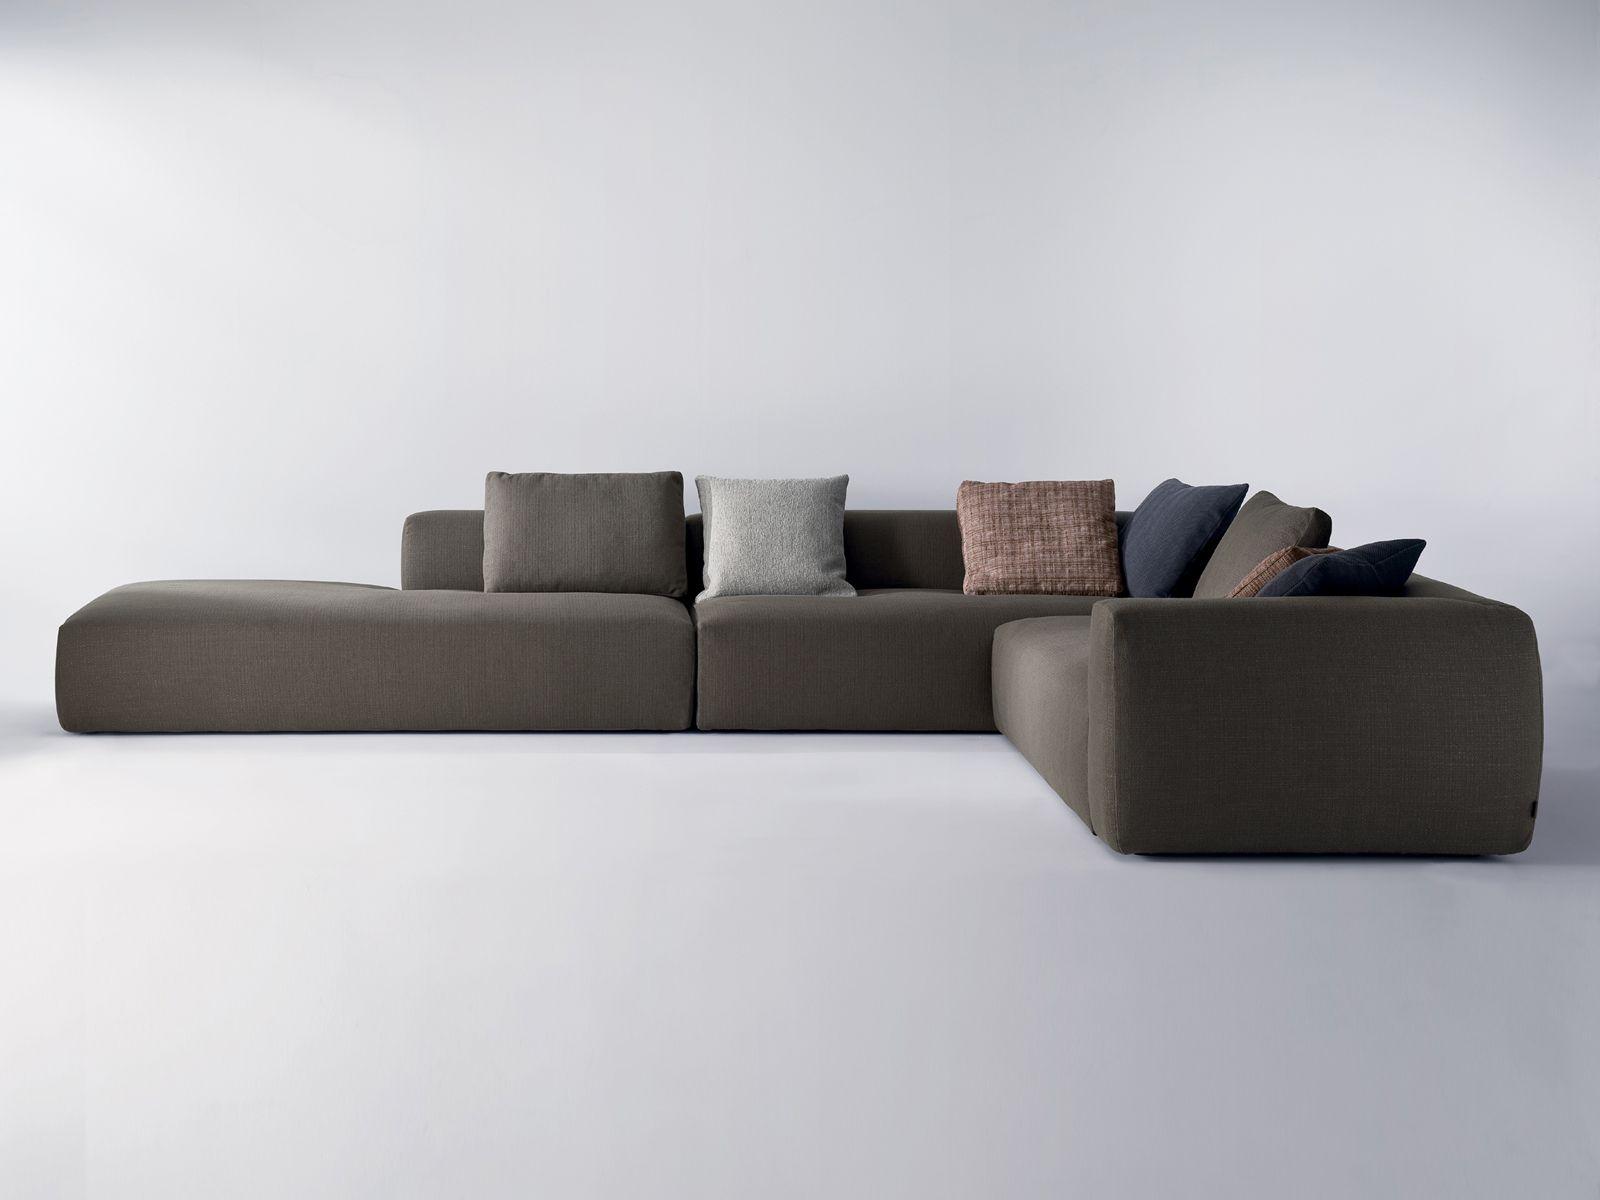 KLUB Divano angolare by i 4 Mariani design Mauro Lipparini